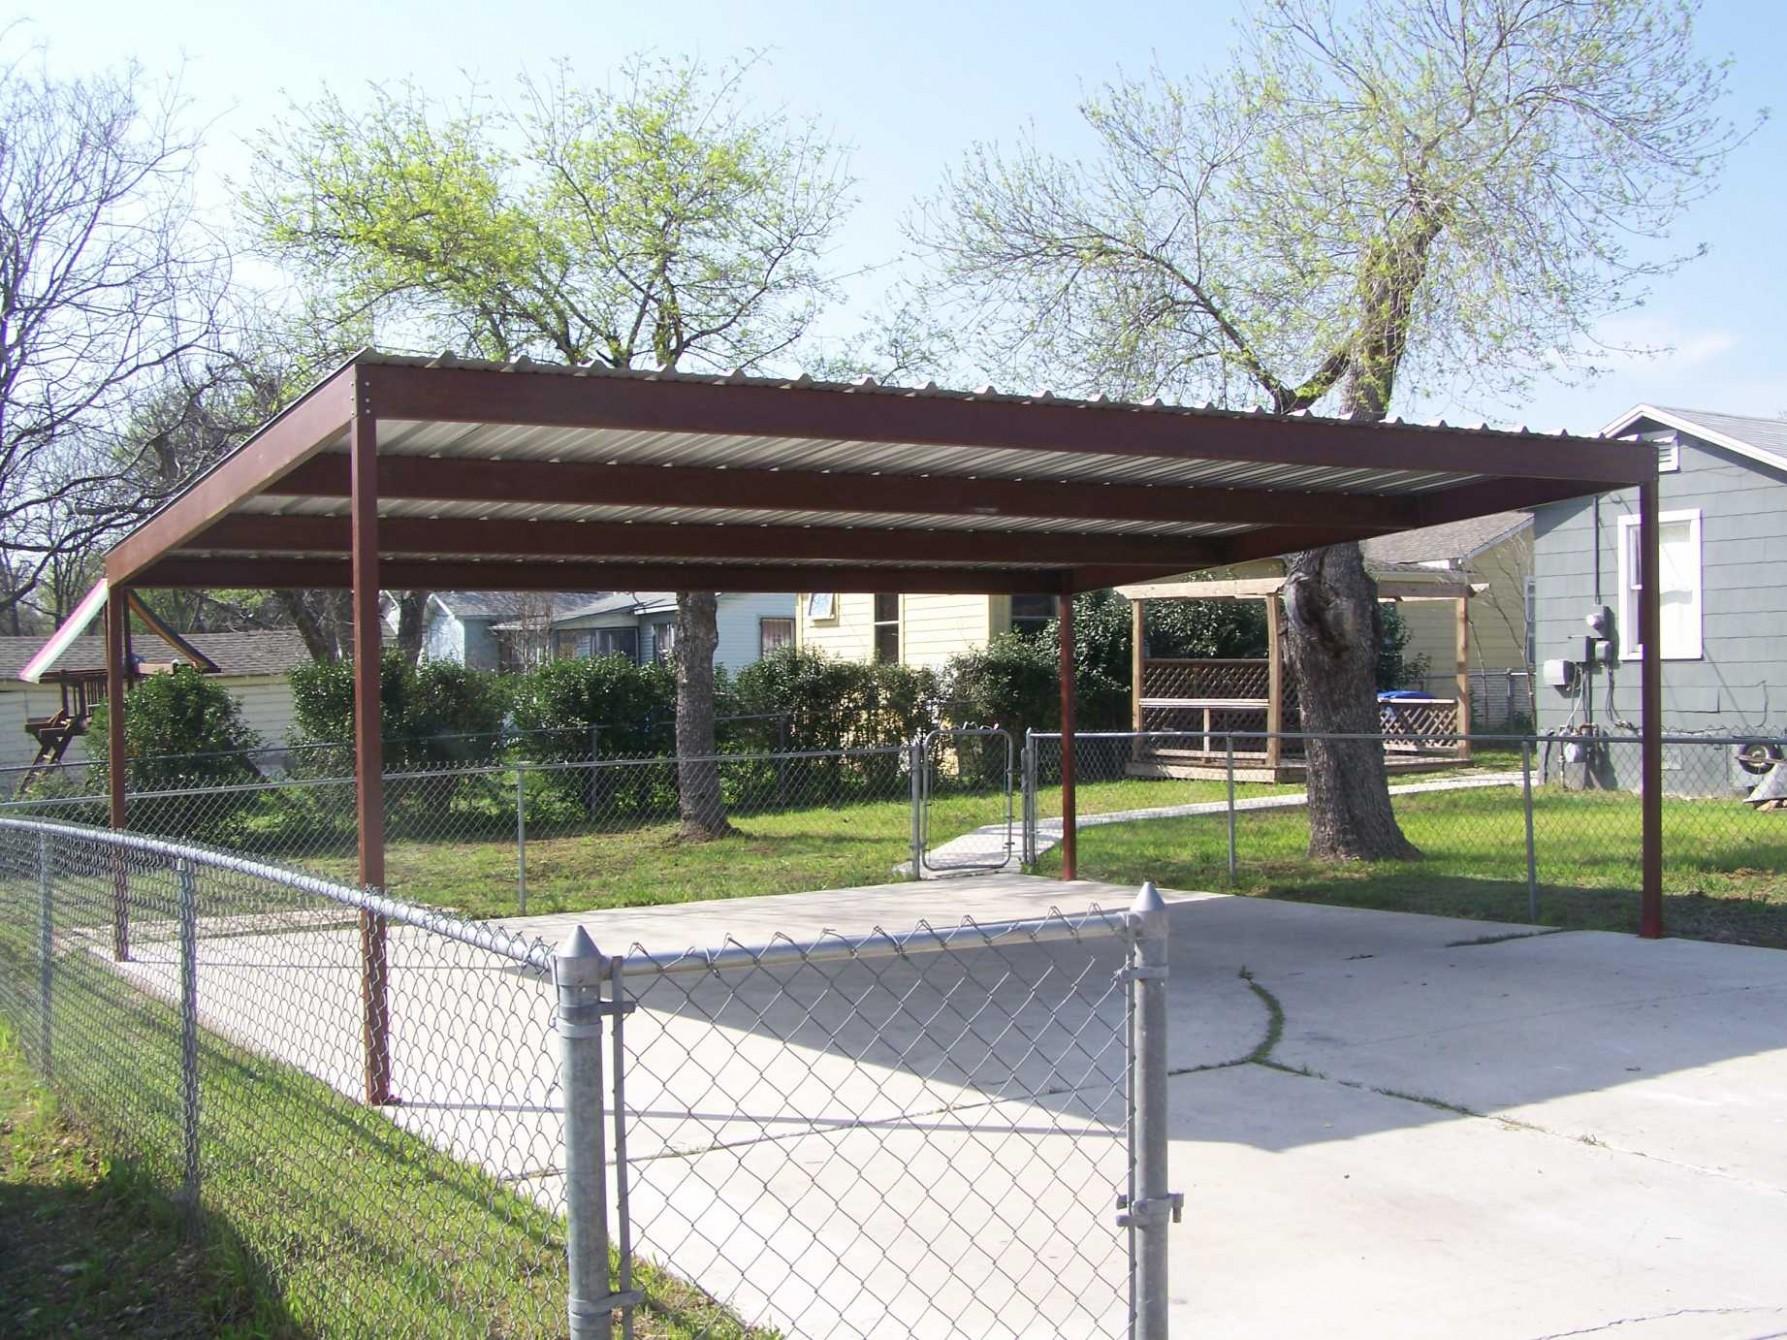 free standing metal carport designs concept - asyfreedomwalk VMONTVI